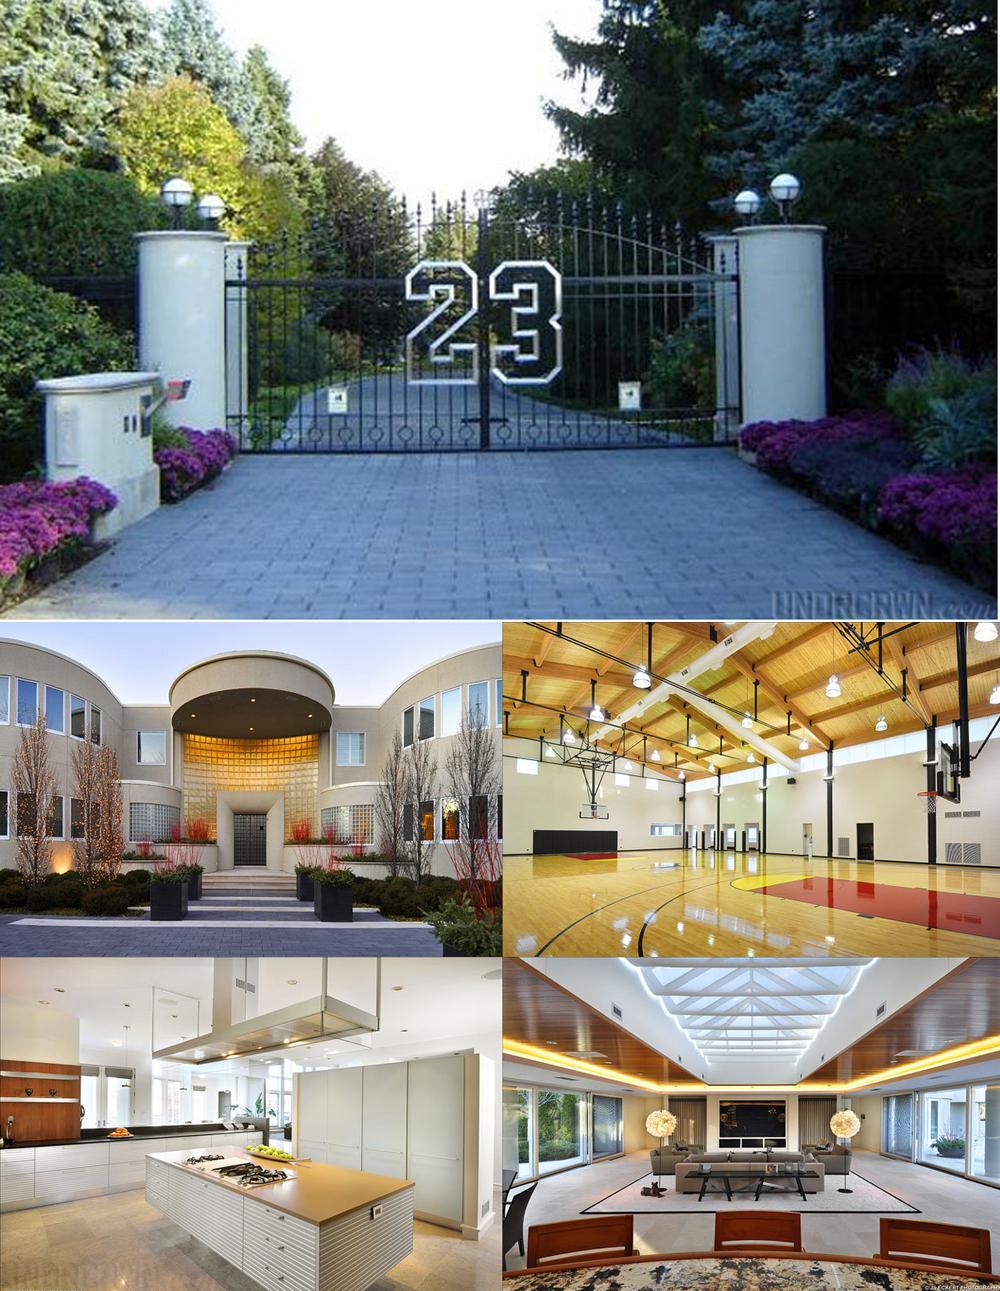 JordanCrib Top 15 Most Expensive Celebrity Homes